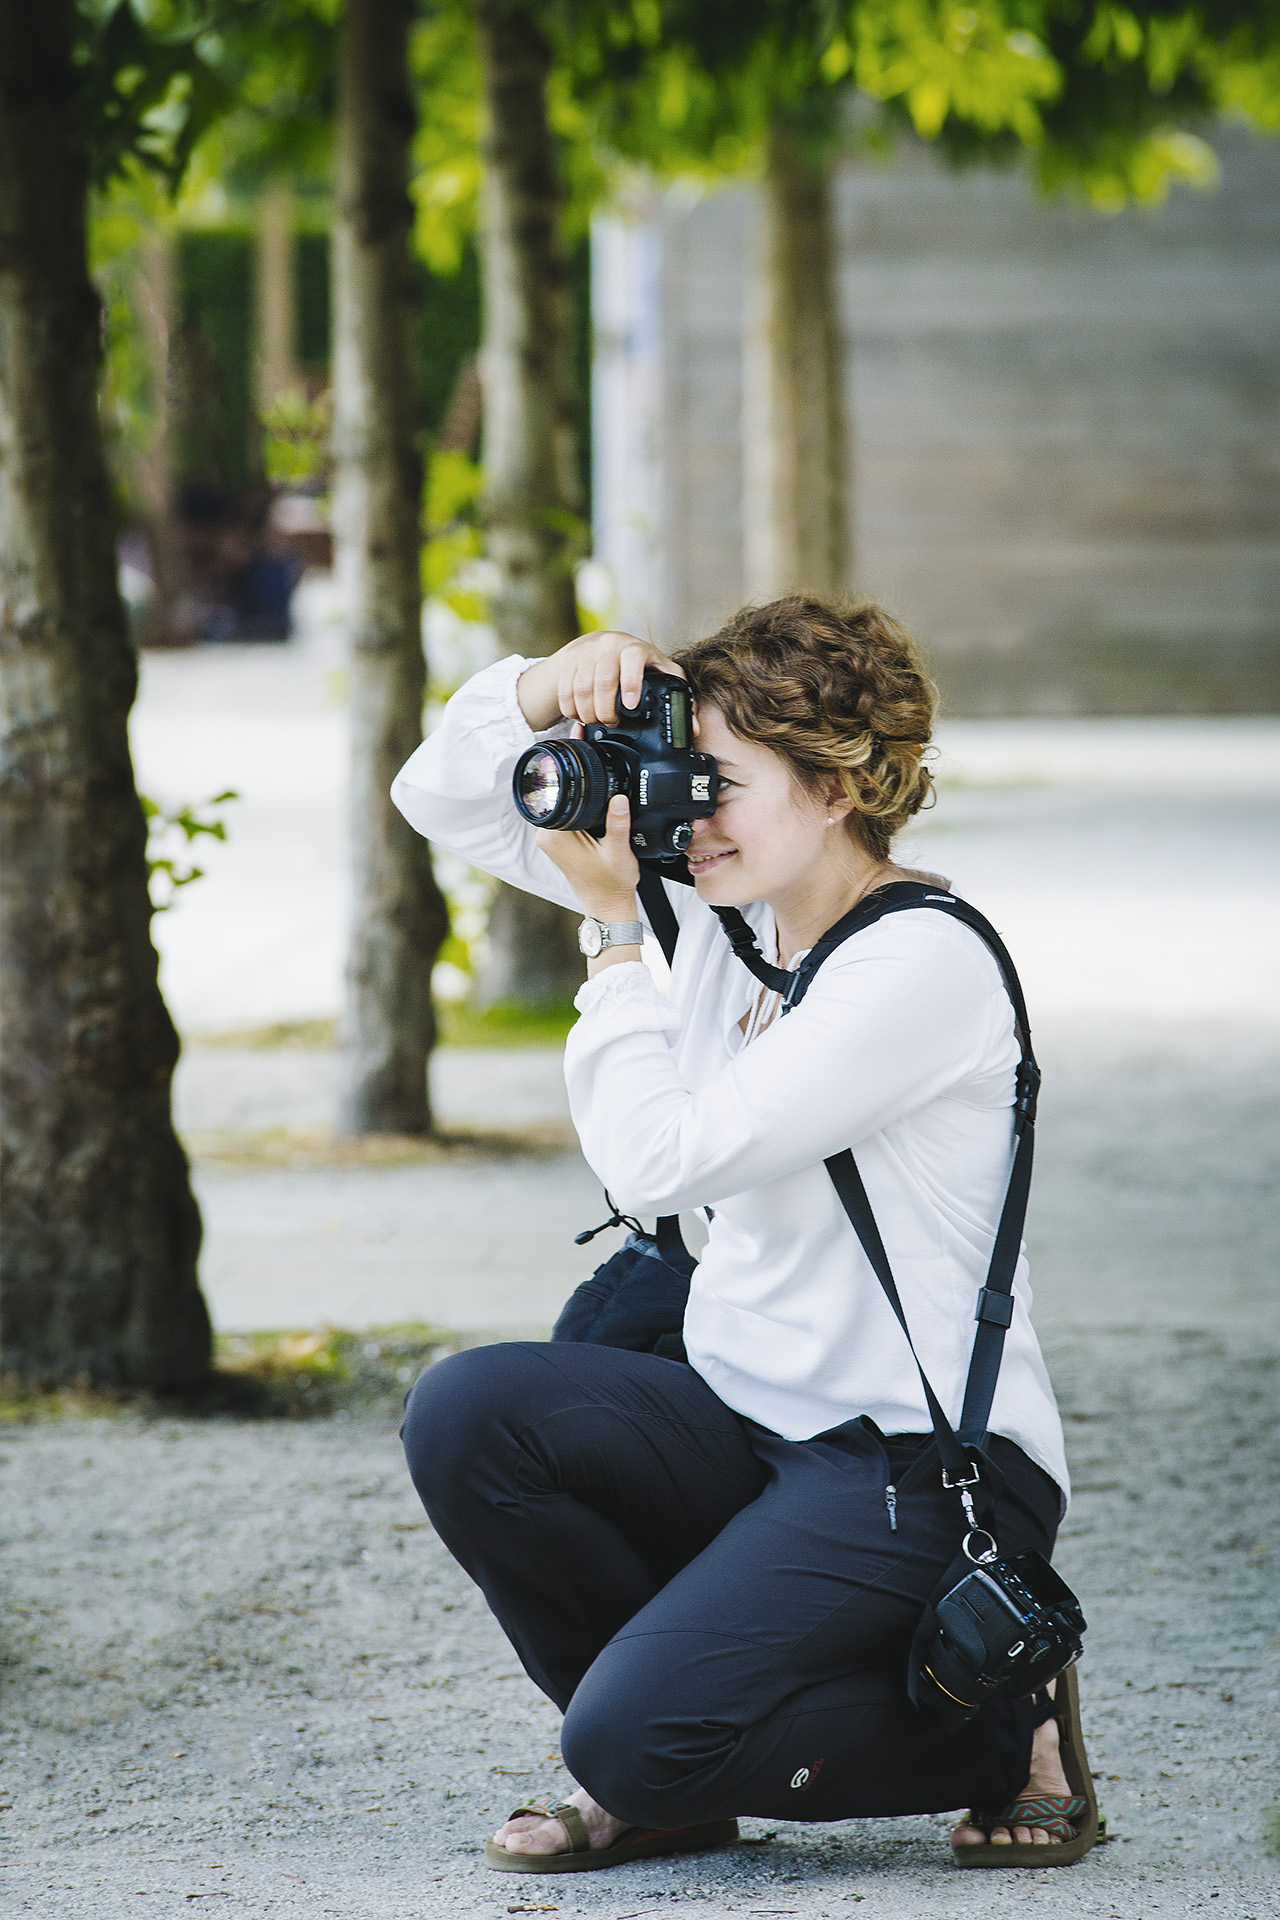 Adrienne-photography-good-photographer-best-hapmshire-photography-london-photographer-wedding-photographer-event2.jpg